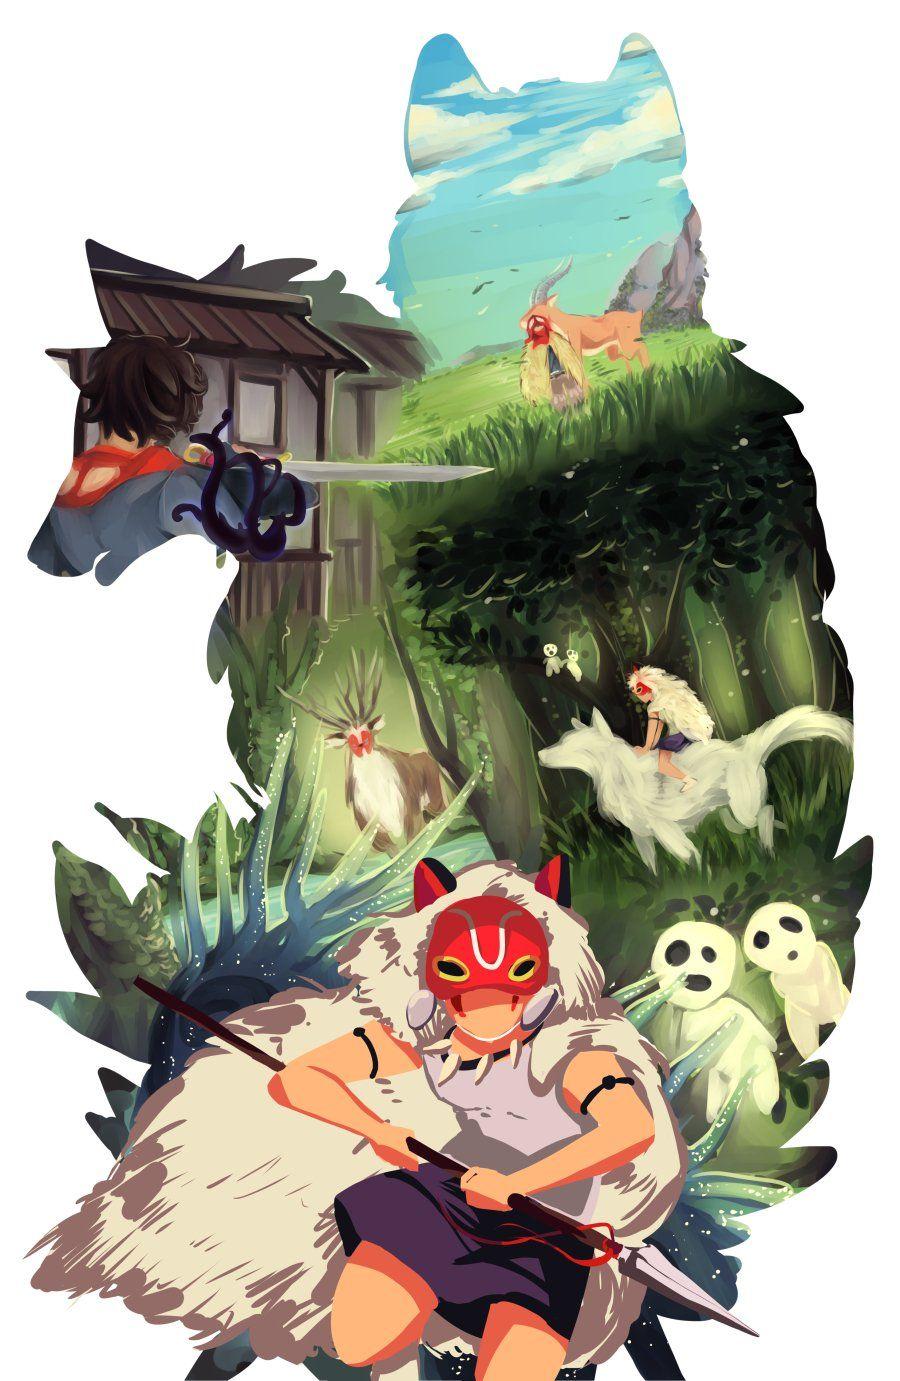 Lectura … Studio ghibli art, Ghibli art, Studio ghibli